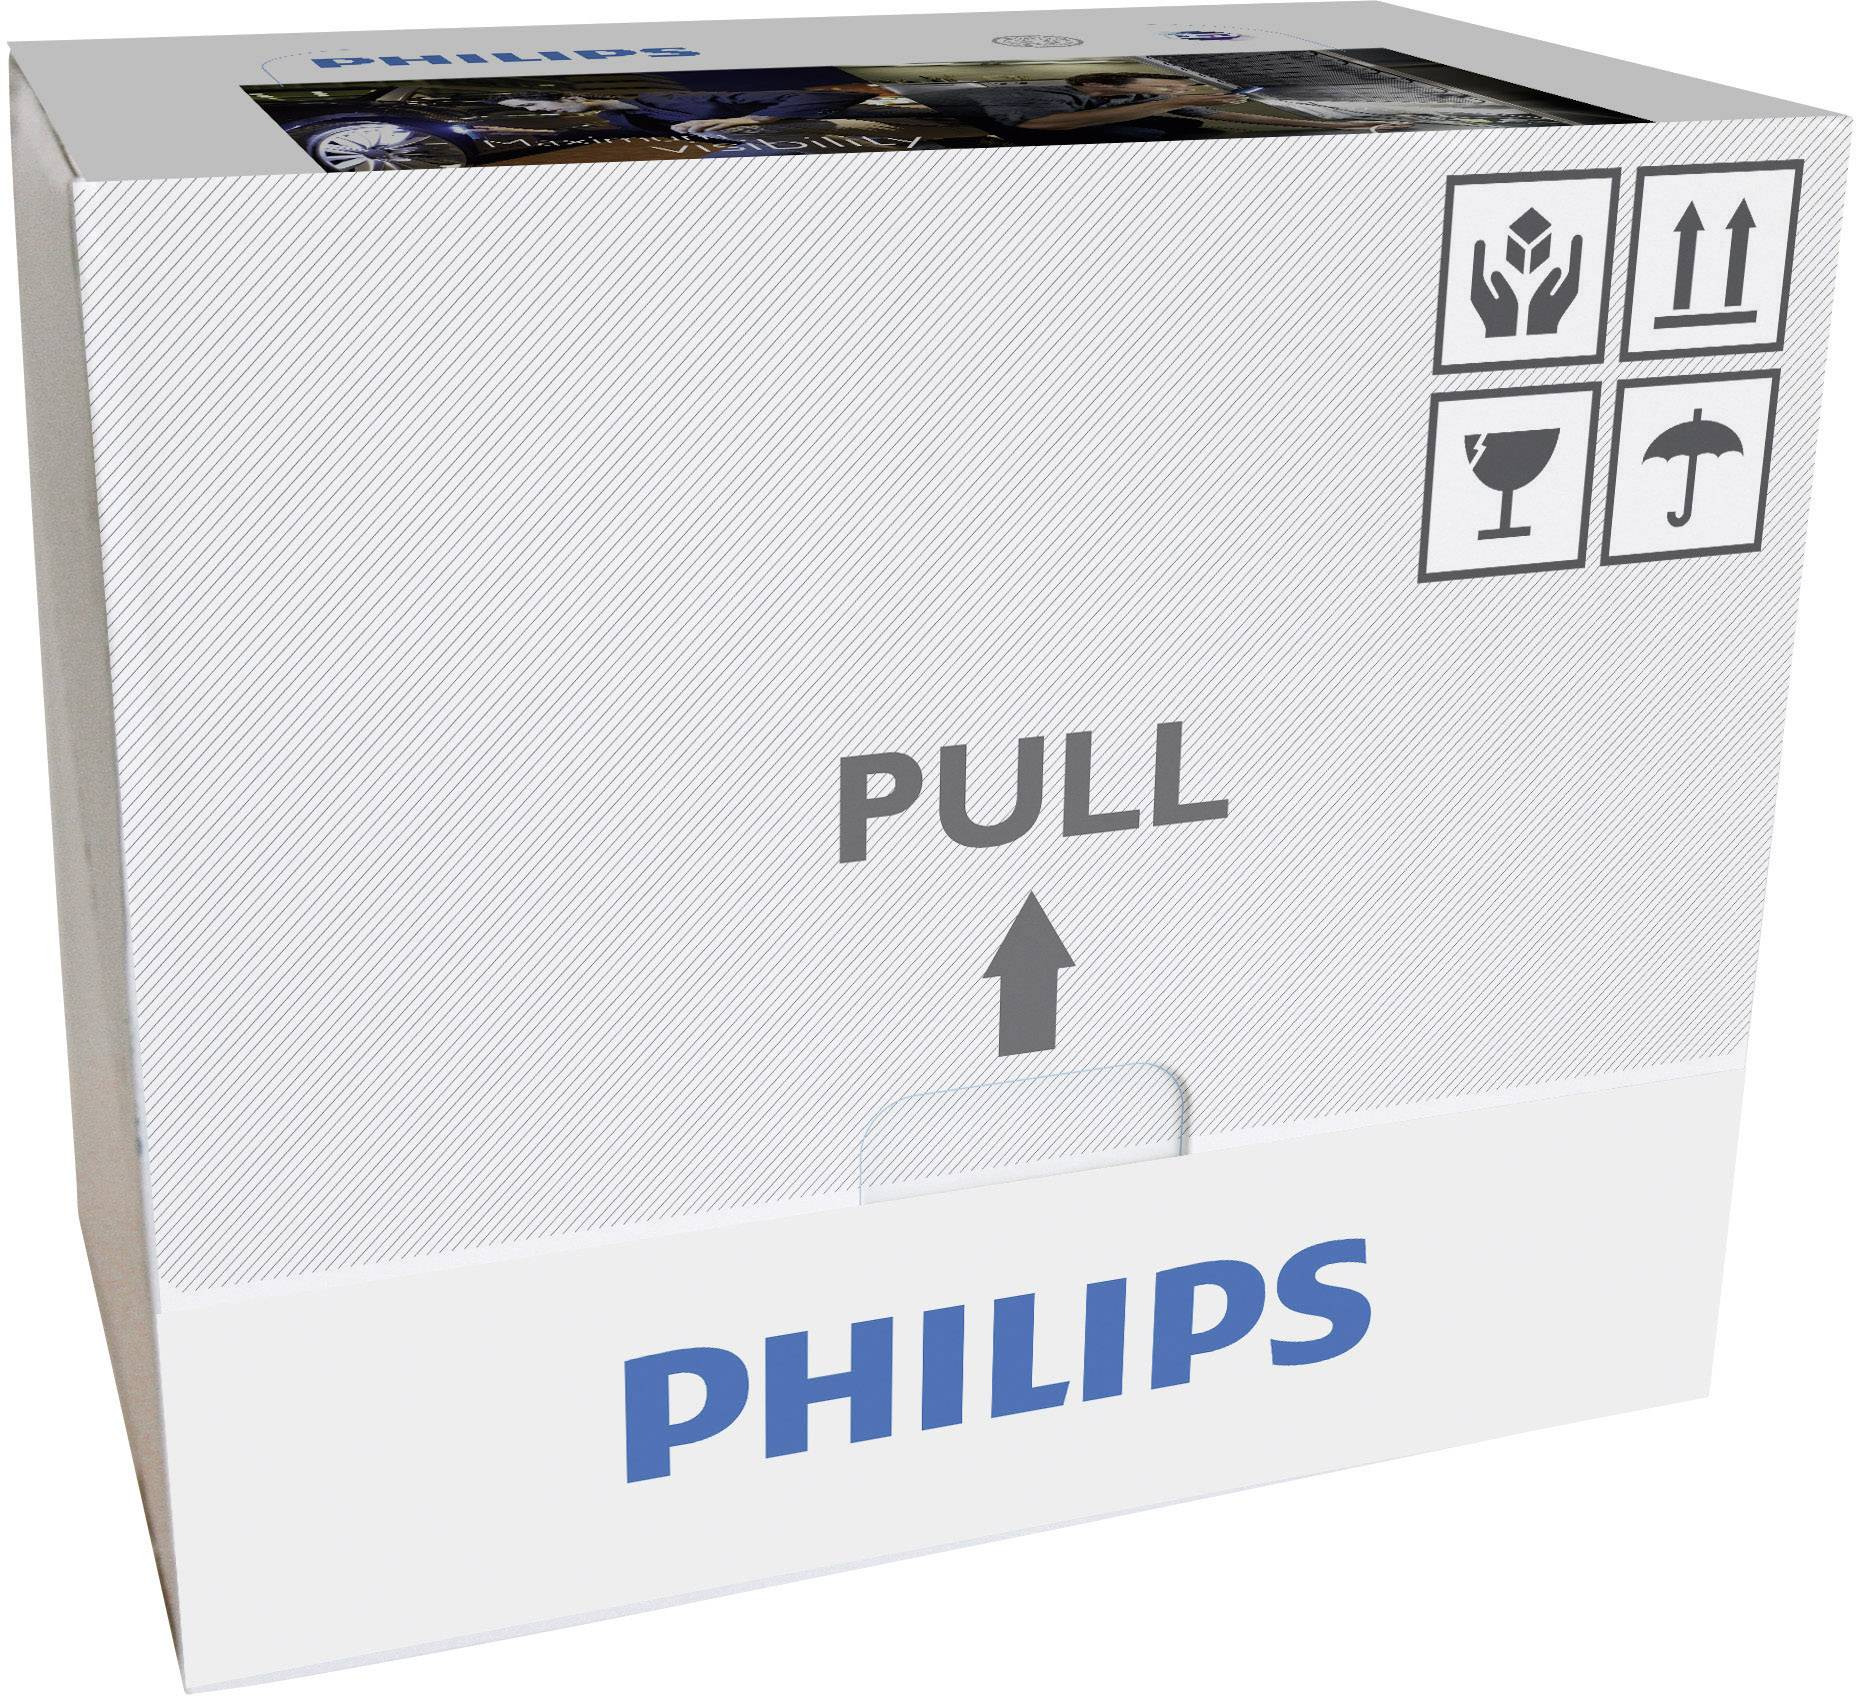 Stylo Led Pile Lm20 Lampe Lm s90 À Philips Lpl18b1 CWredBxo